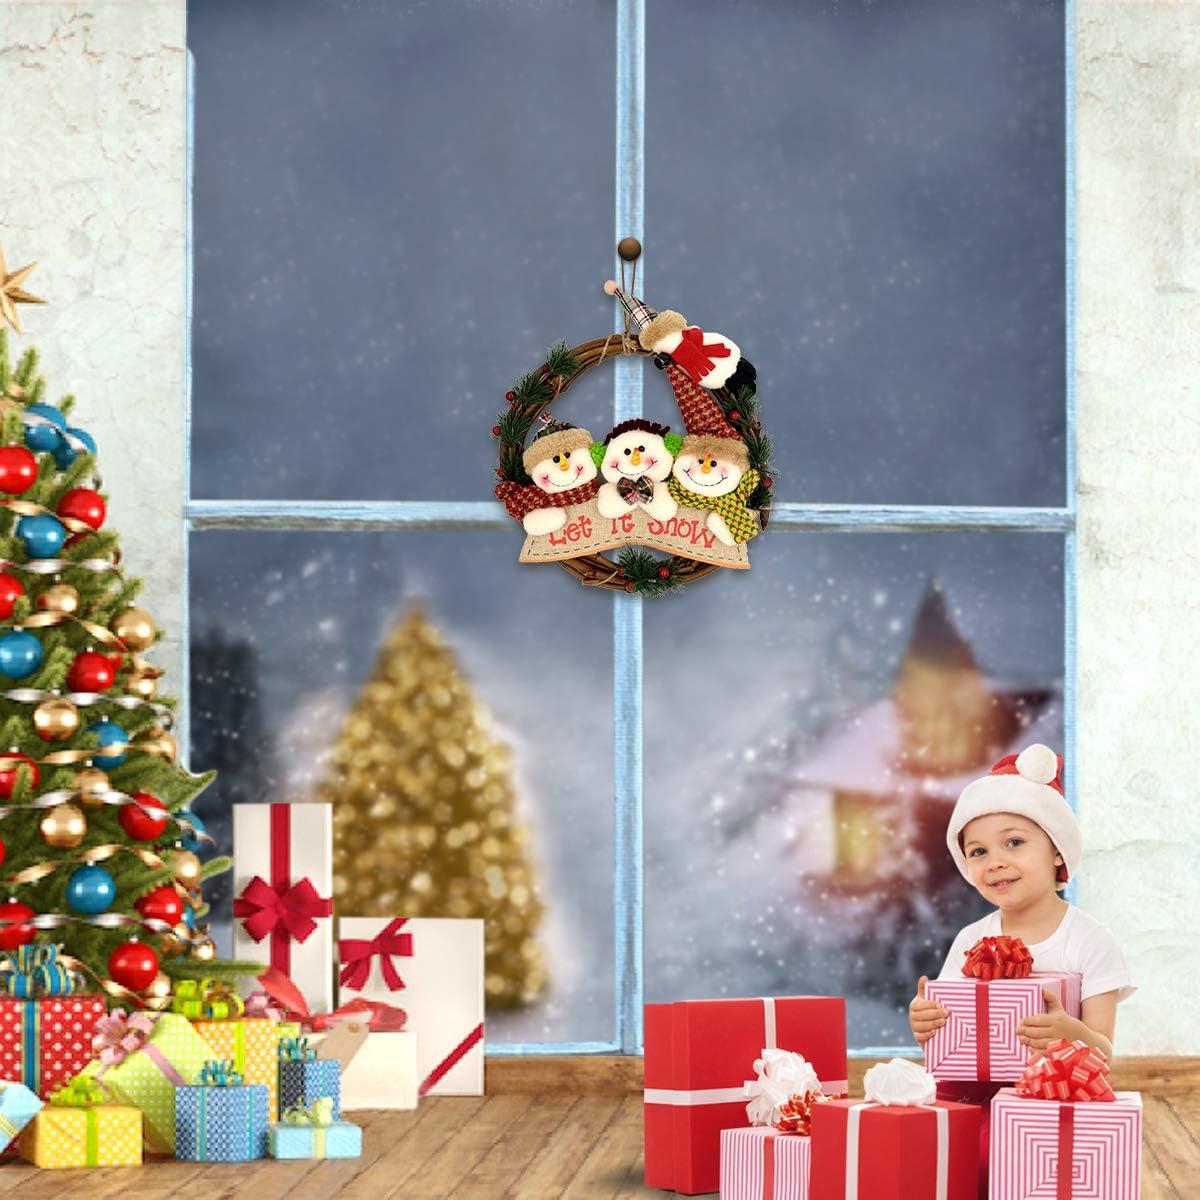 HARBORII Christmas Decoration Merry Christmas Wreath Cute Wreath Christmas Wreath Christmas